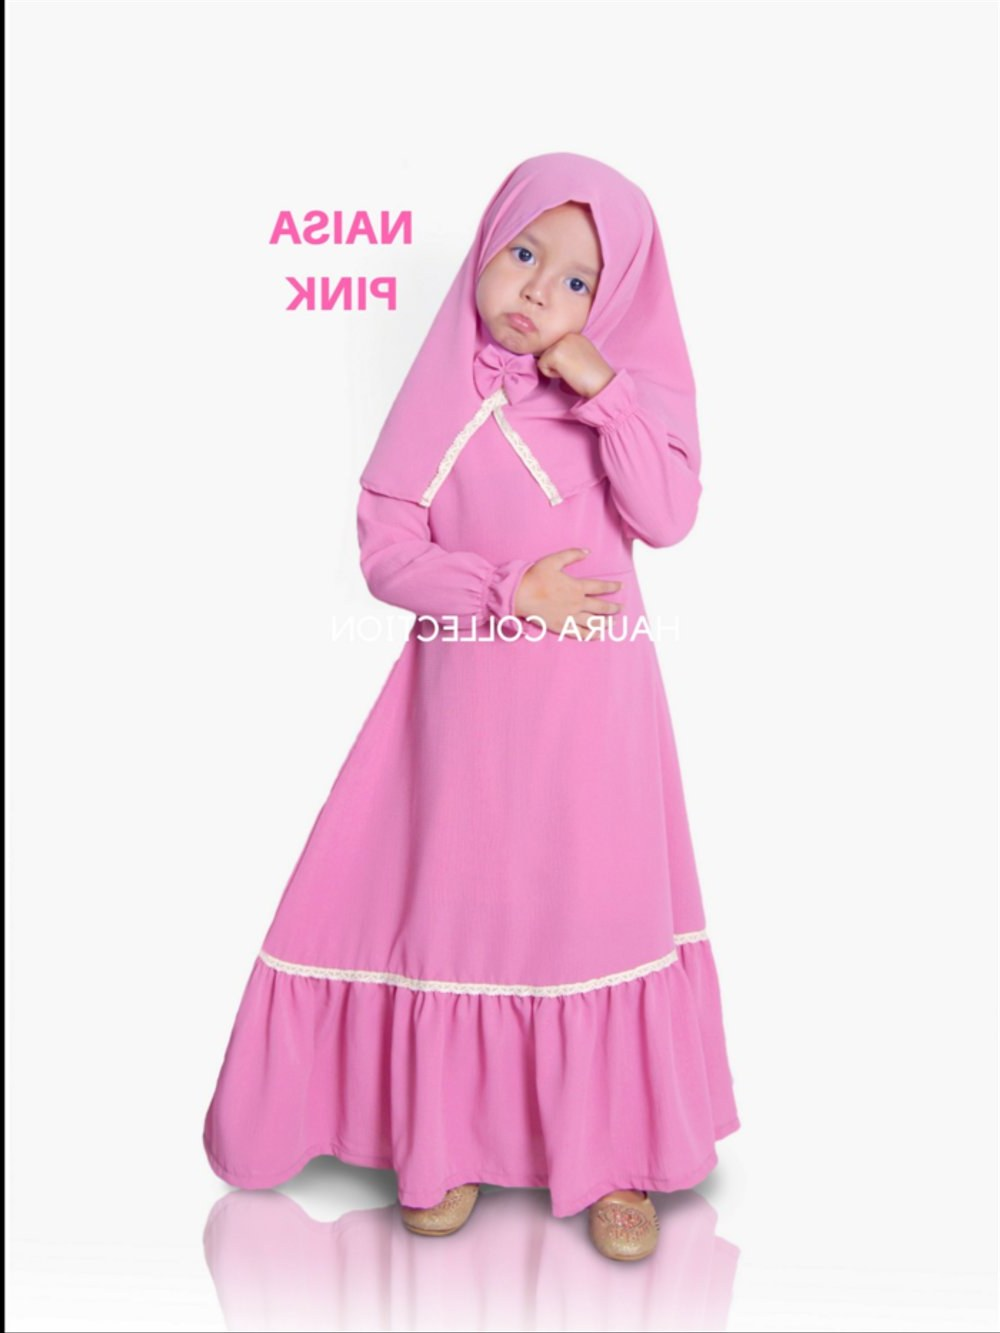 Bentuk Gaun Pengantin Muslimah Ala Princess S1du Bayi